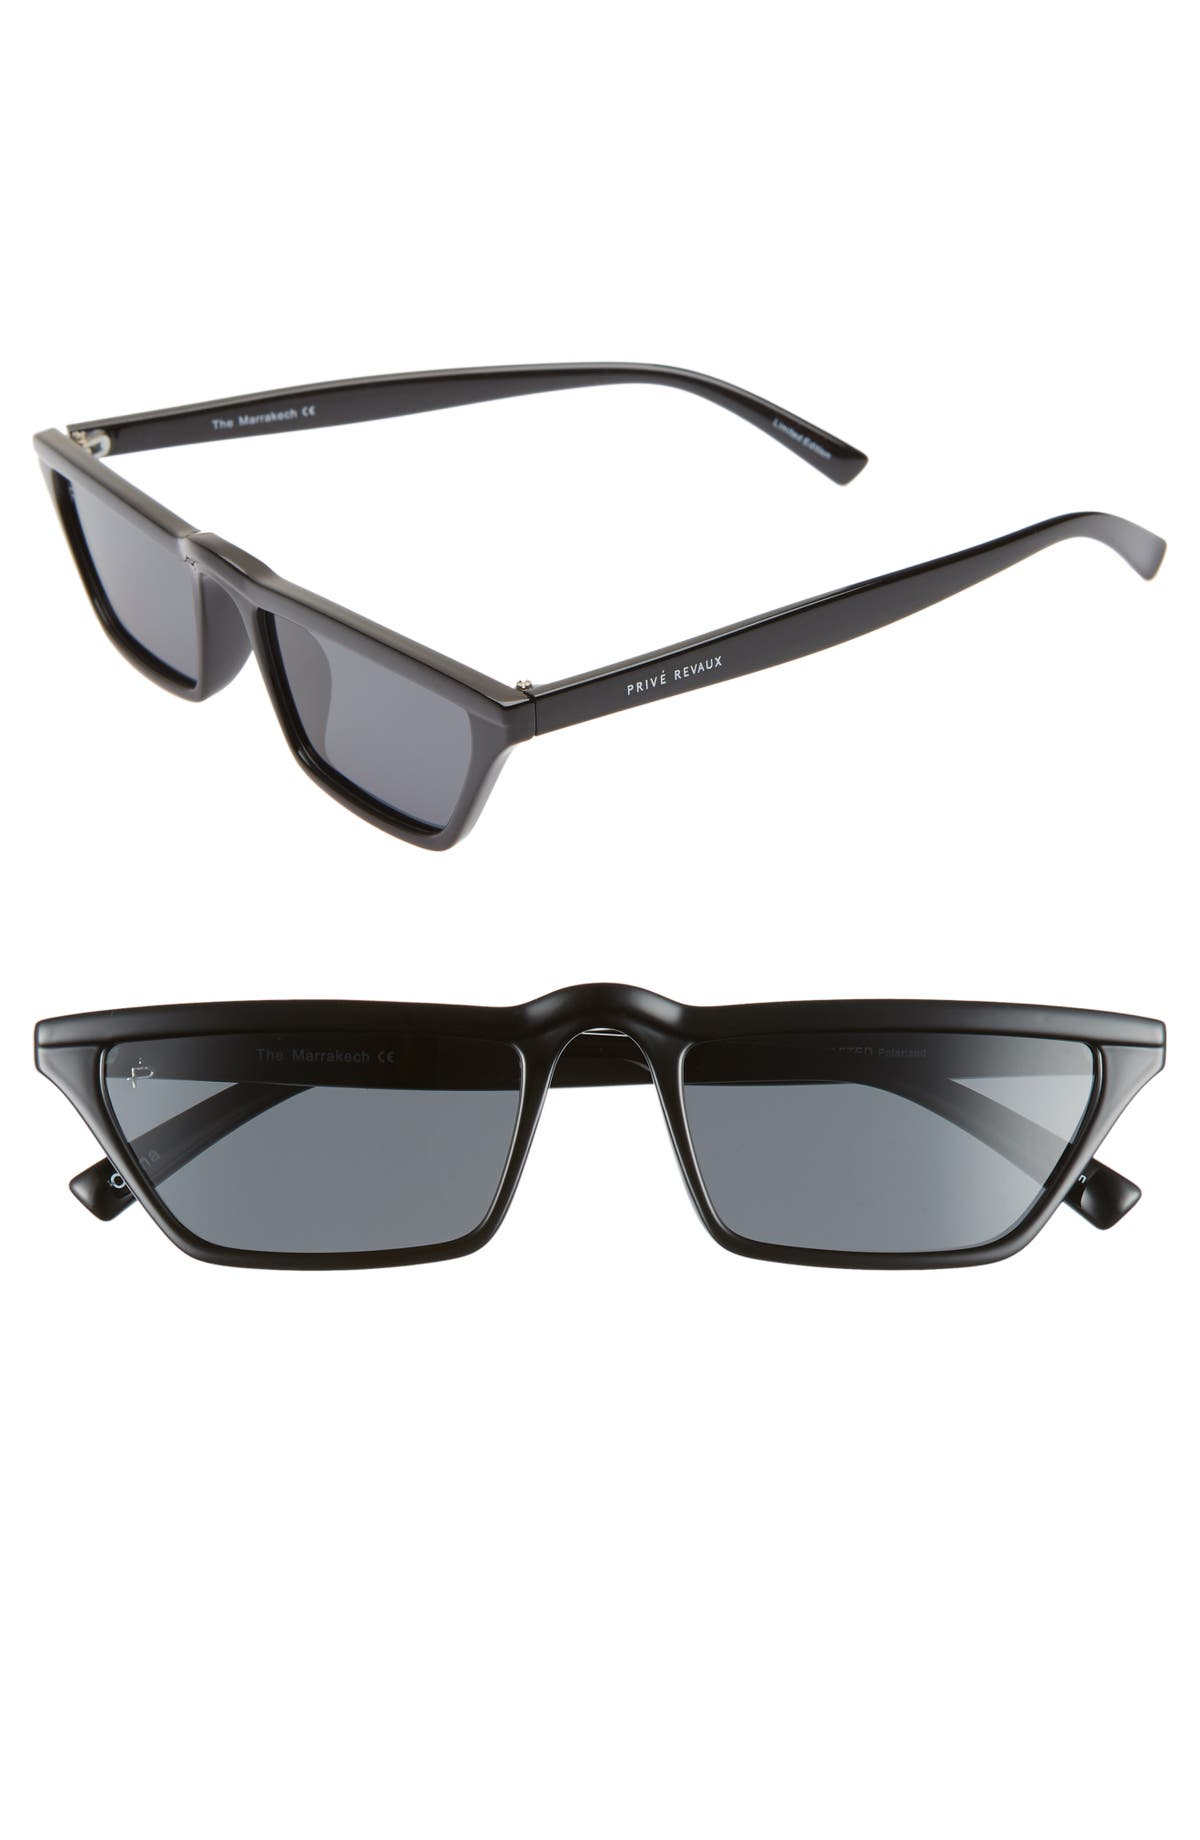 317fb7e0a89 Privé Revaux The Marrakech 52mm Square Sunglasses